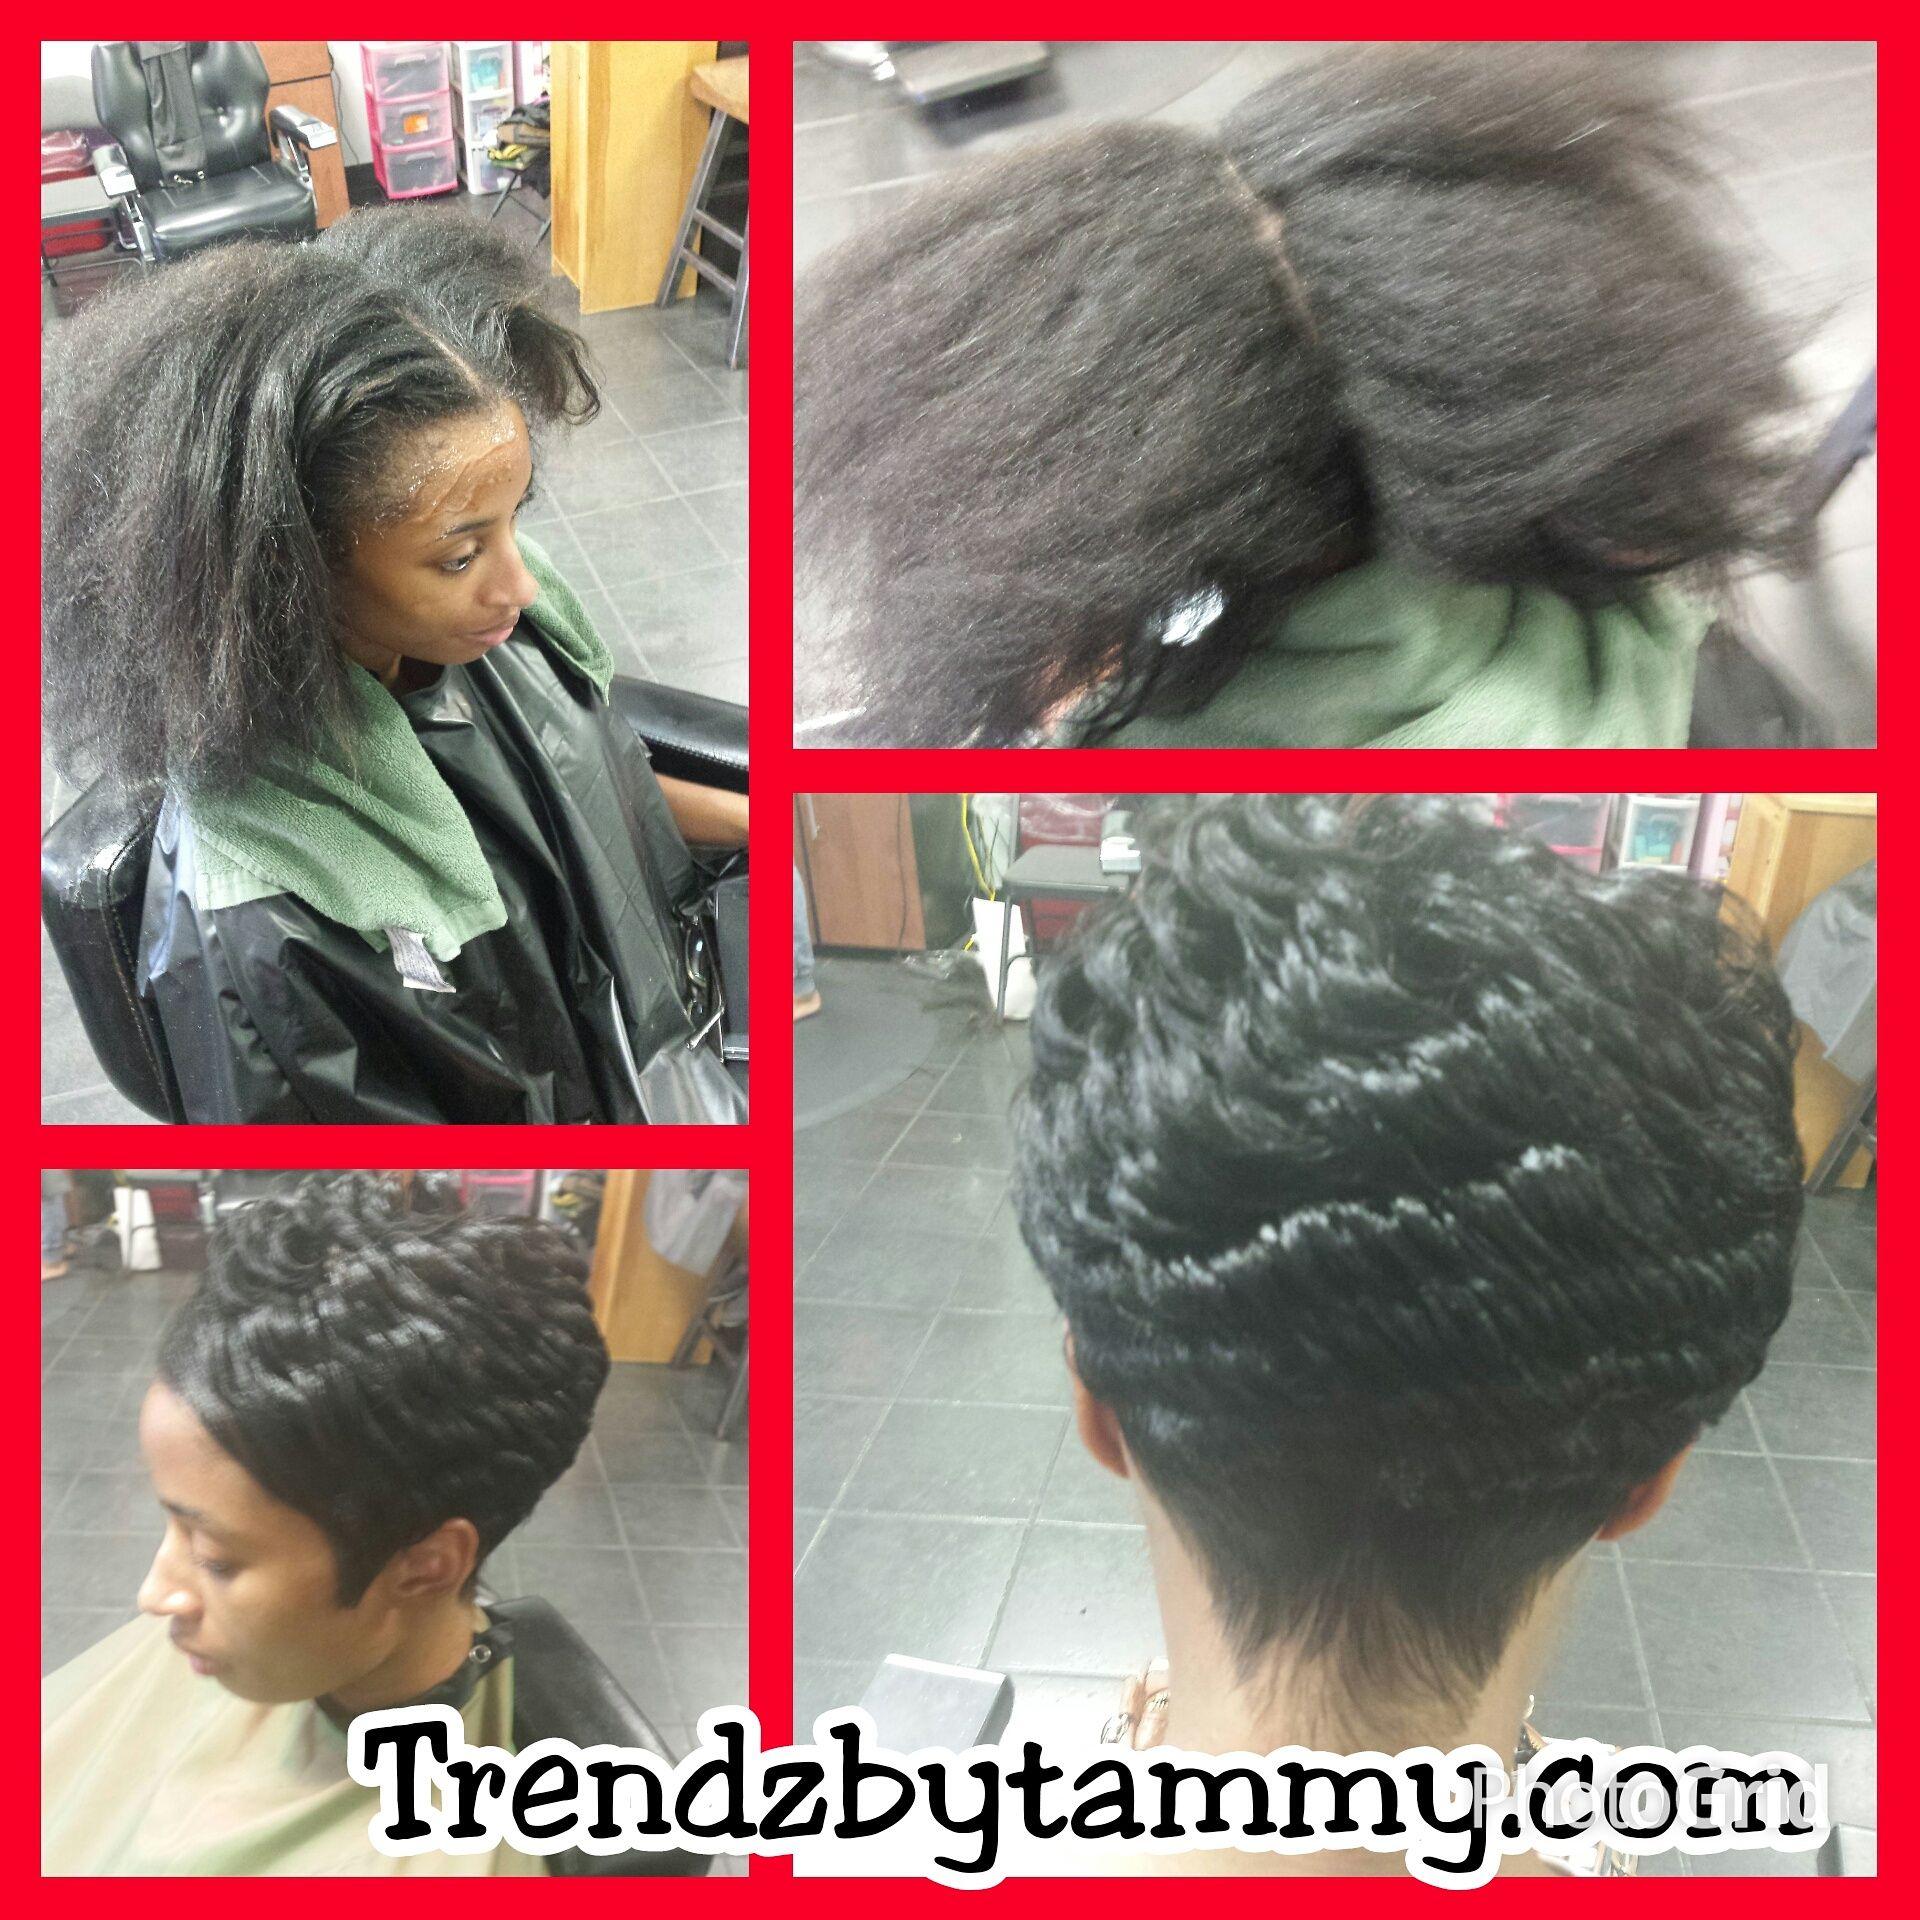 Short Haircut Makeover At Trendz By Tammy Hair Salon Houston Pearland Tx Black Hair Salons Short Hair Styles Pixie Pixie Hairstyles